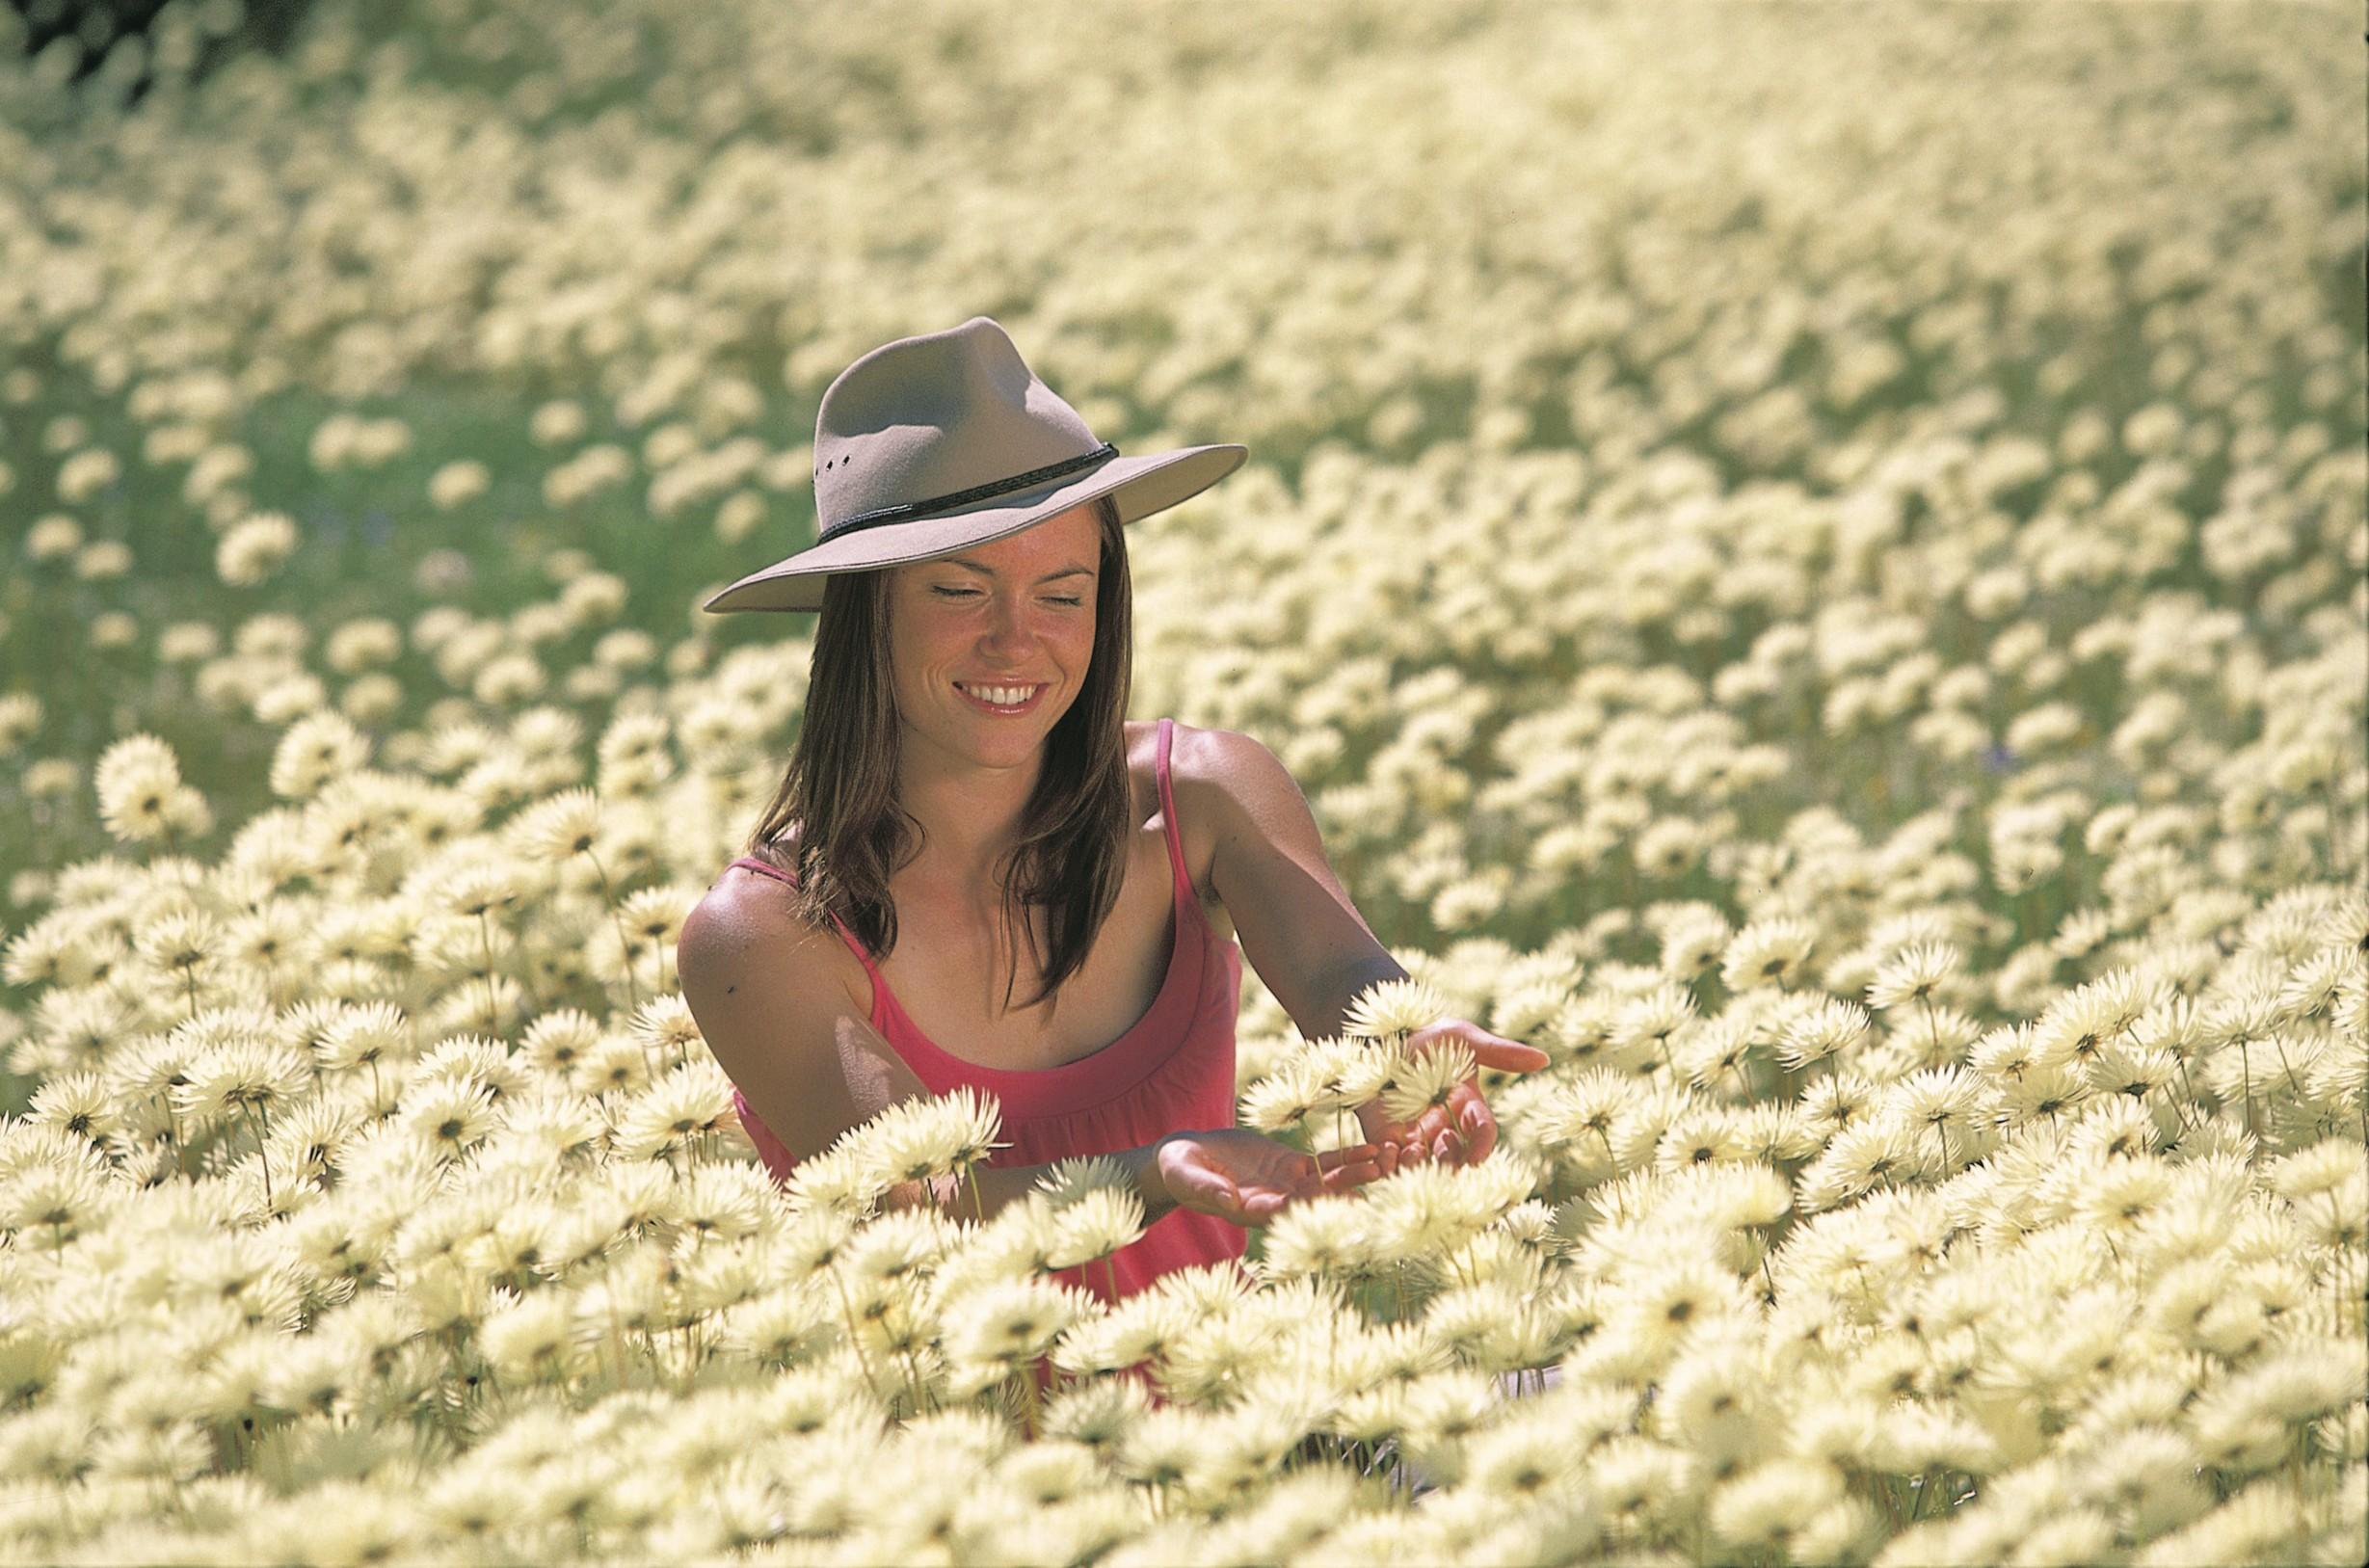 Lady in white Splendid Everlastings (Rhodanthe chlorocephala)